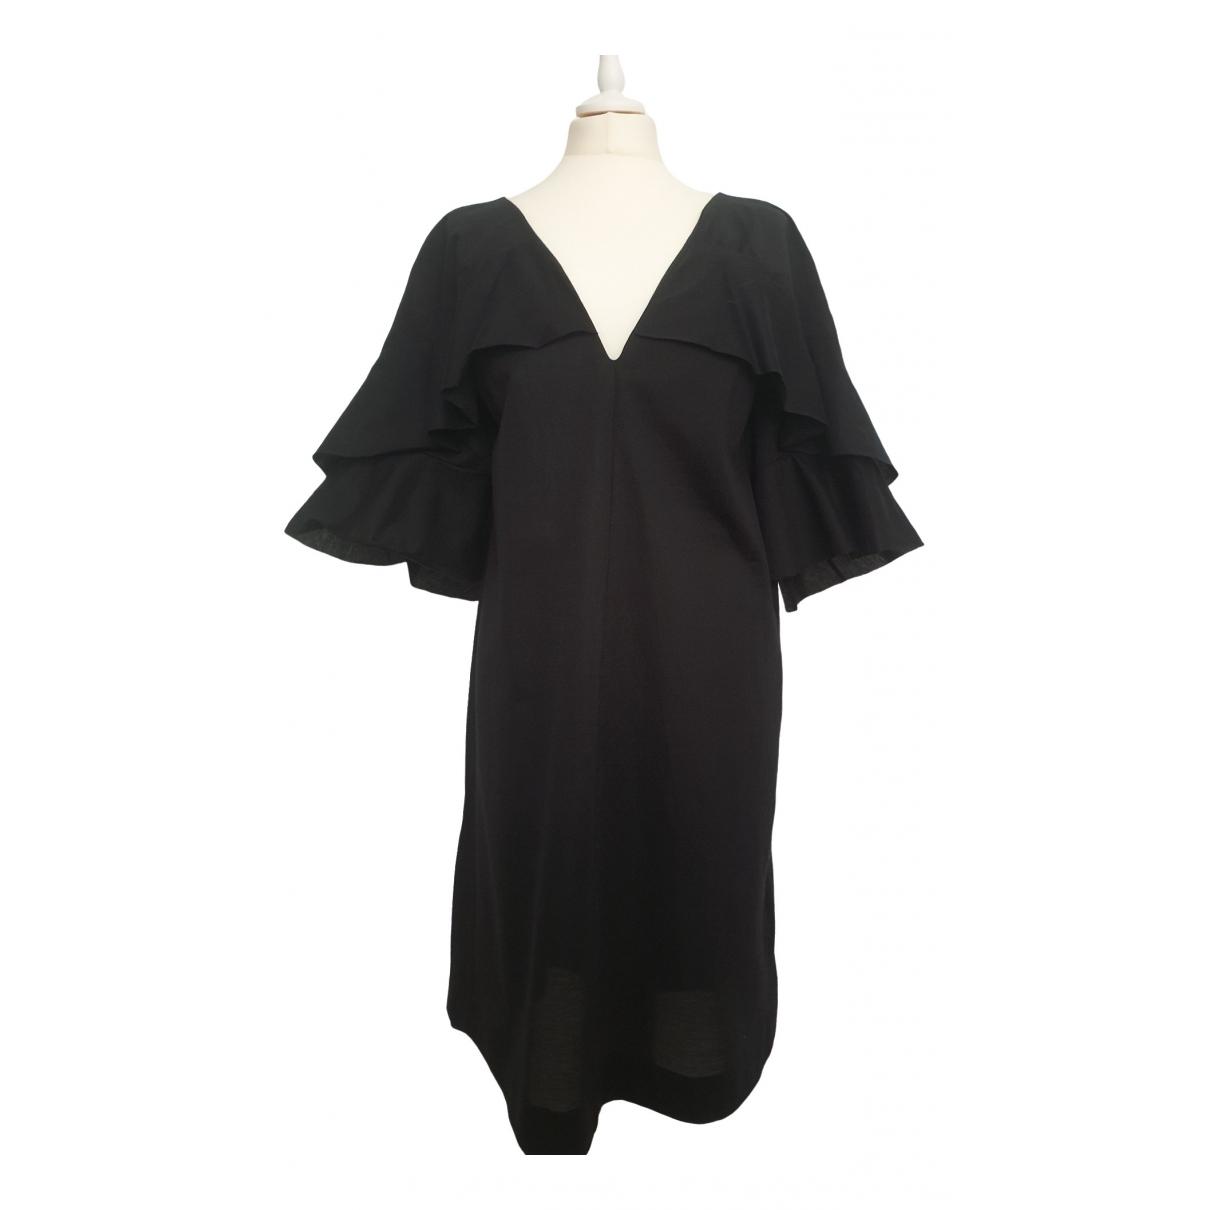 Dorothee Schumacher \N Black Cotton dress for Women 4 UK